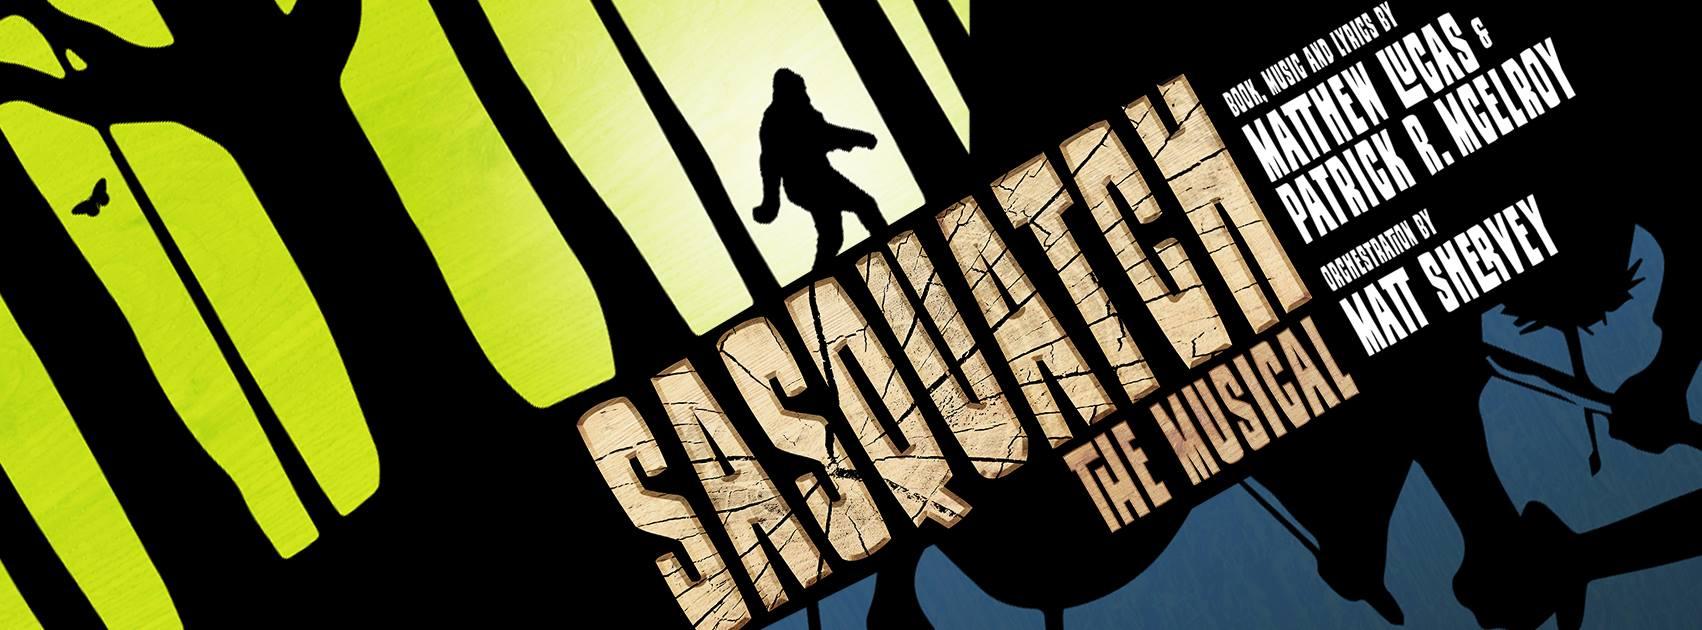 Sasquatch: The Musical